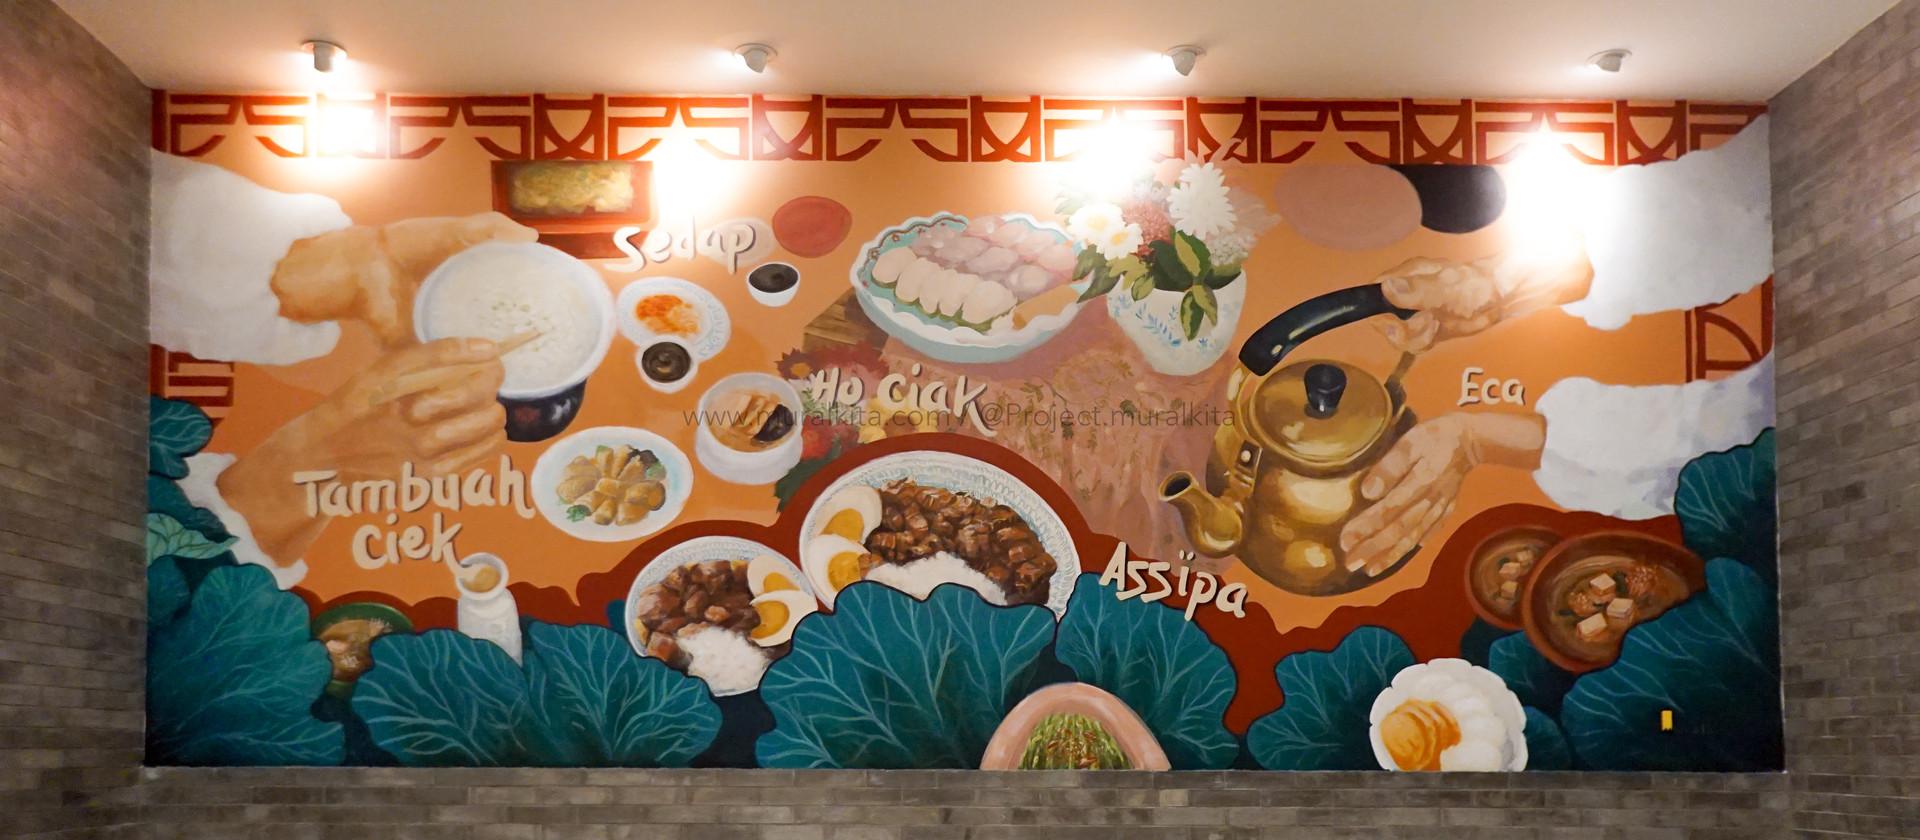 Spot 2 - Green Sedayu Mall Lt.2 - Foodalicious